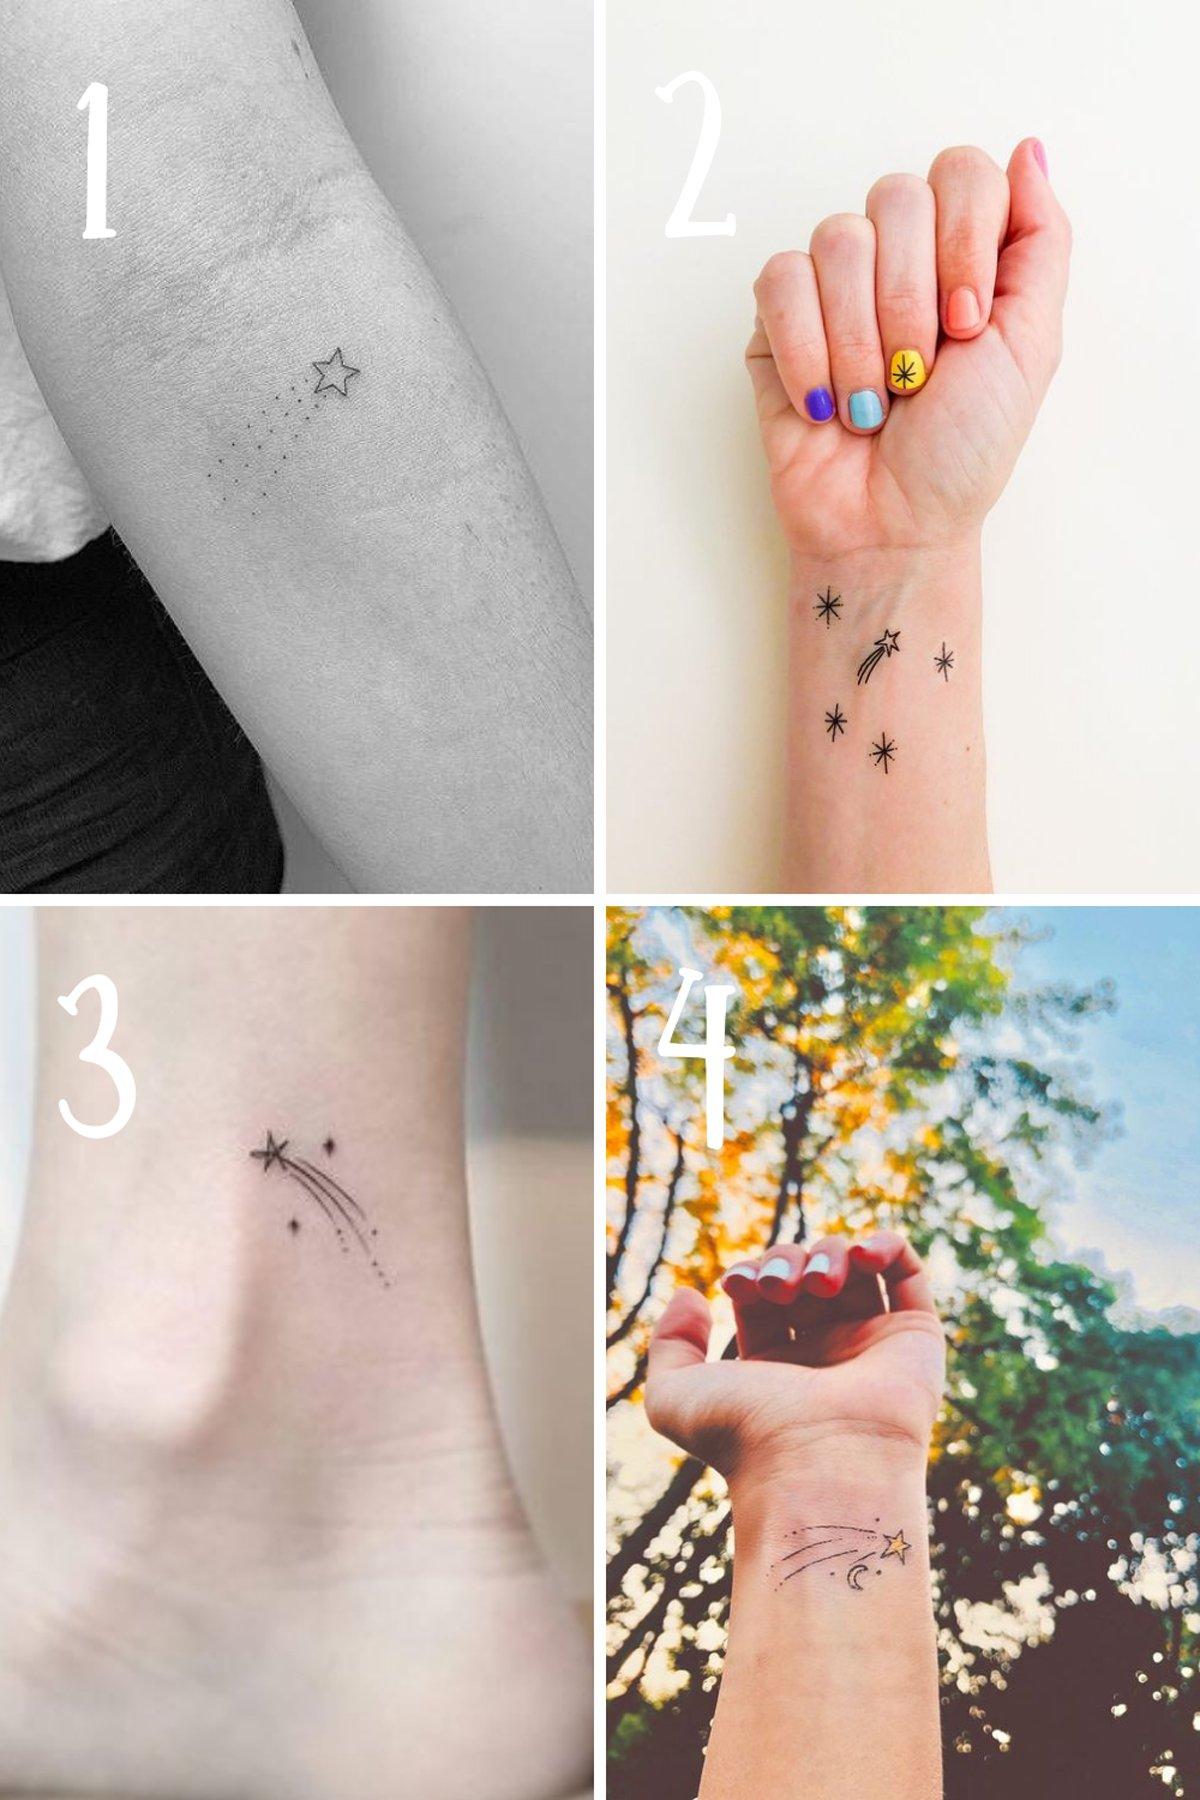 Shooting Star Tattoos Ideas